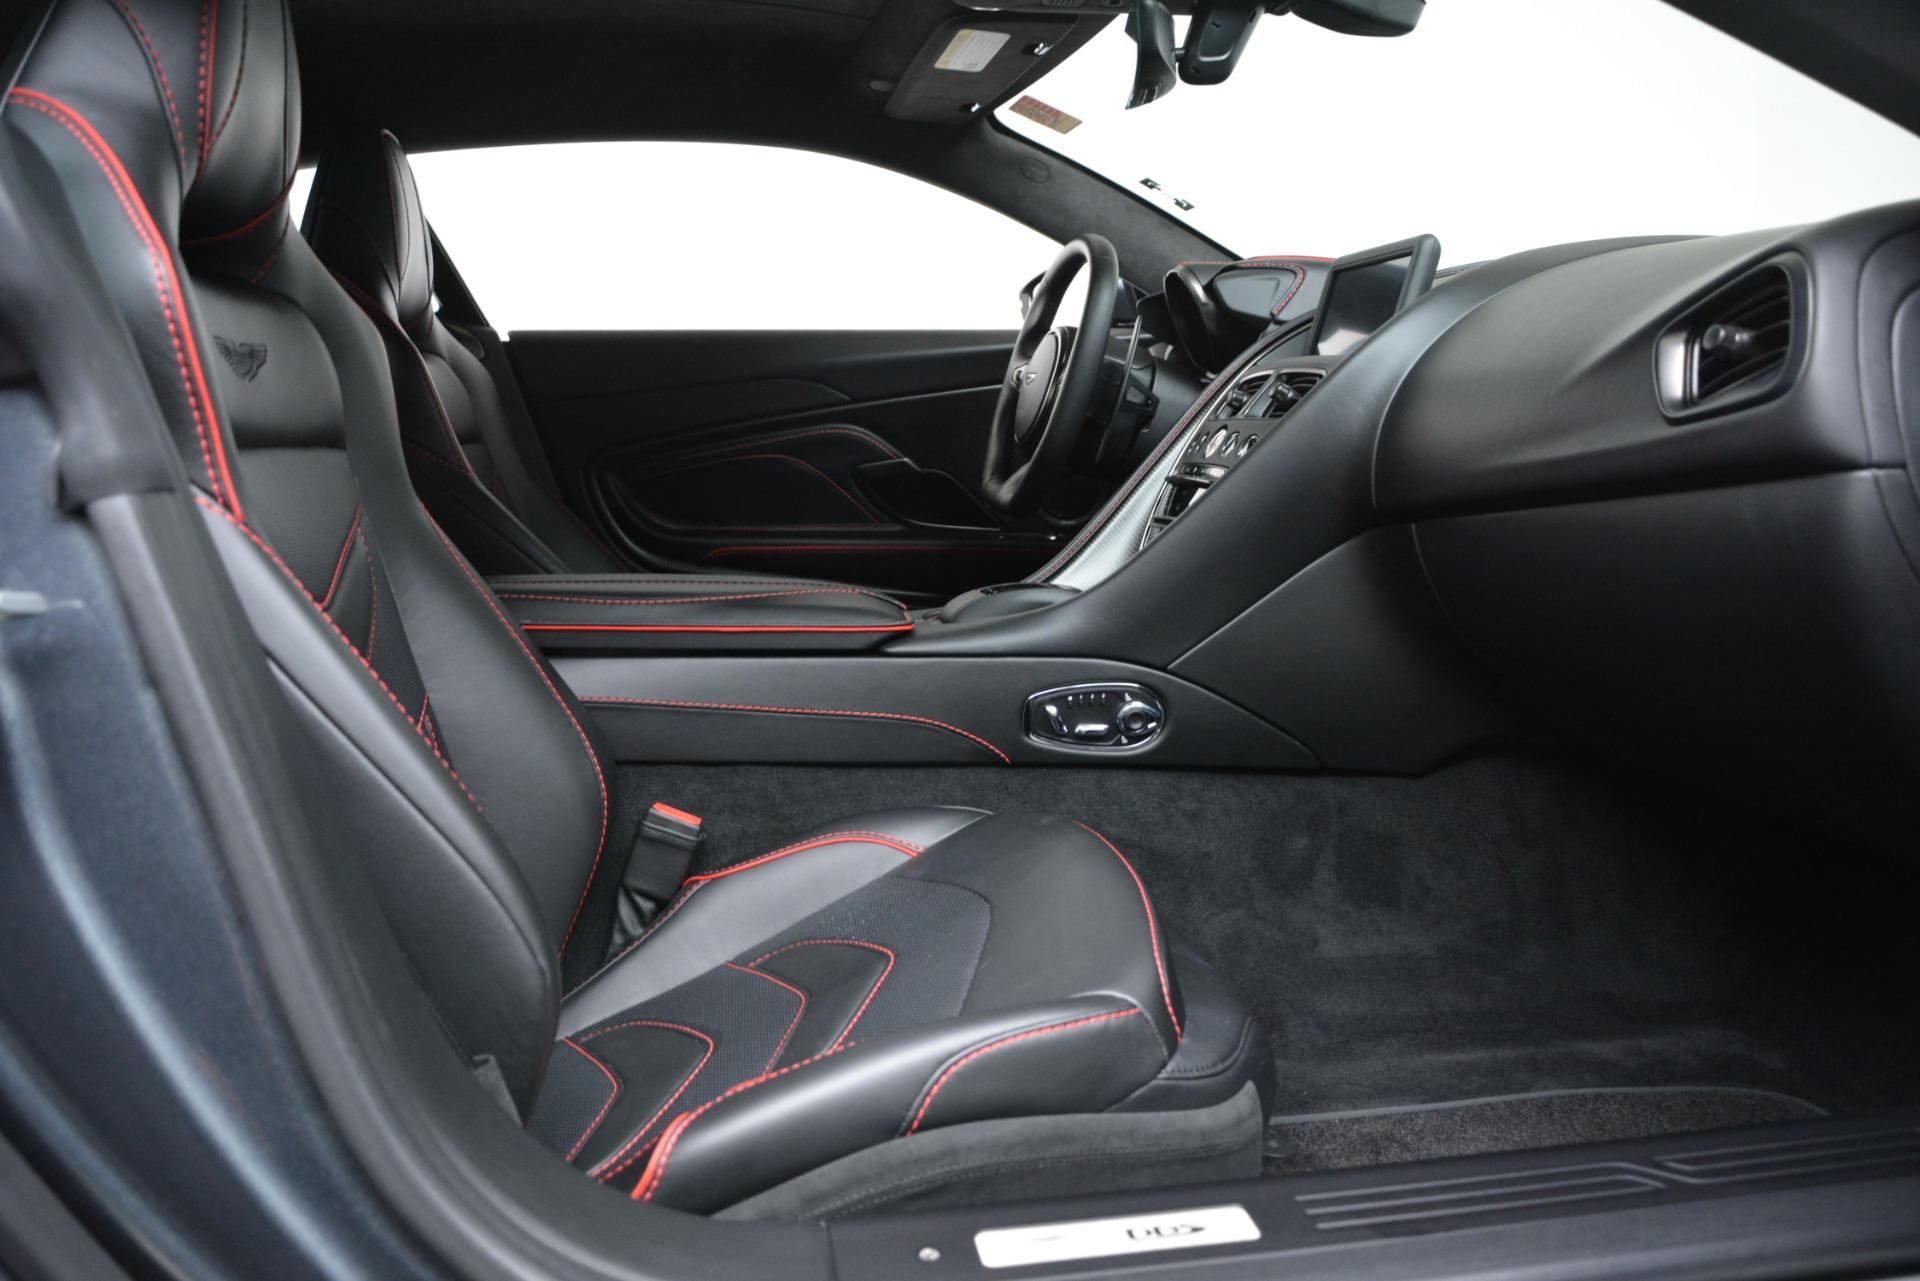 New 2019 Aston Martin DBS Superleggera For Sale In Greenwich, CT 3318_p15